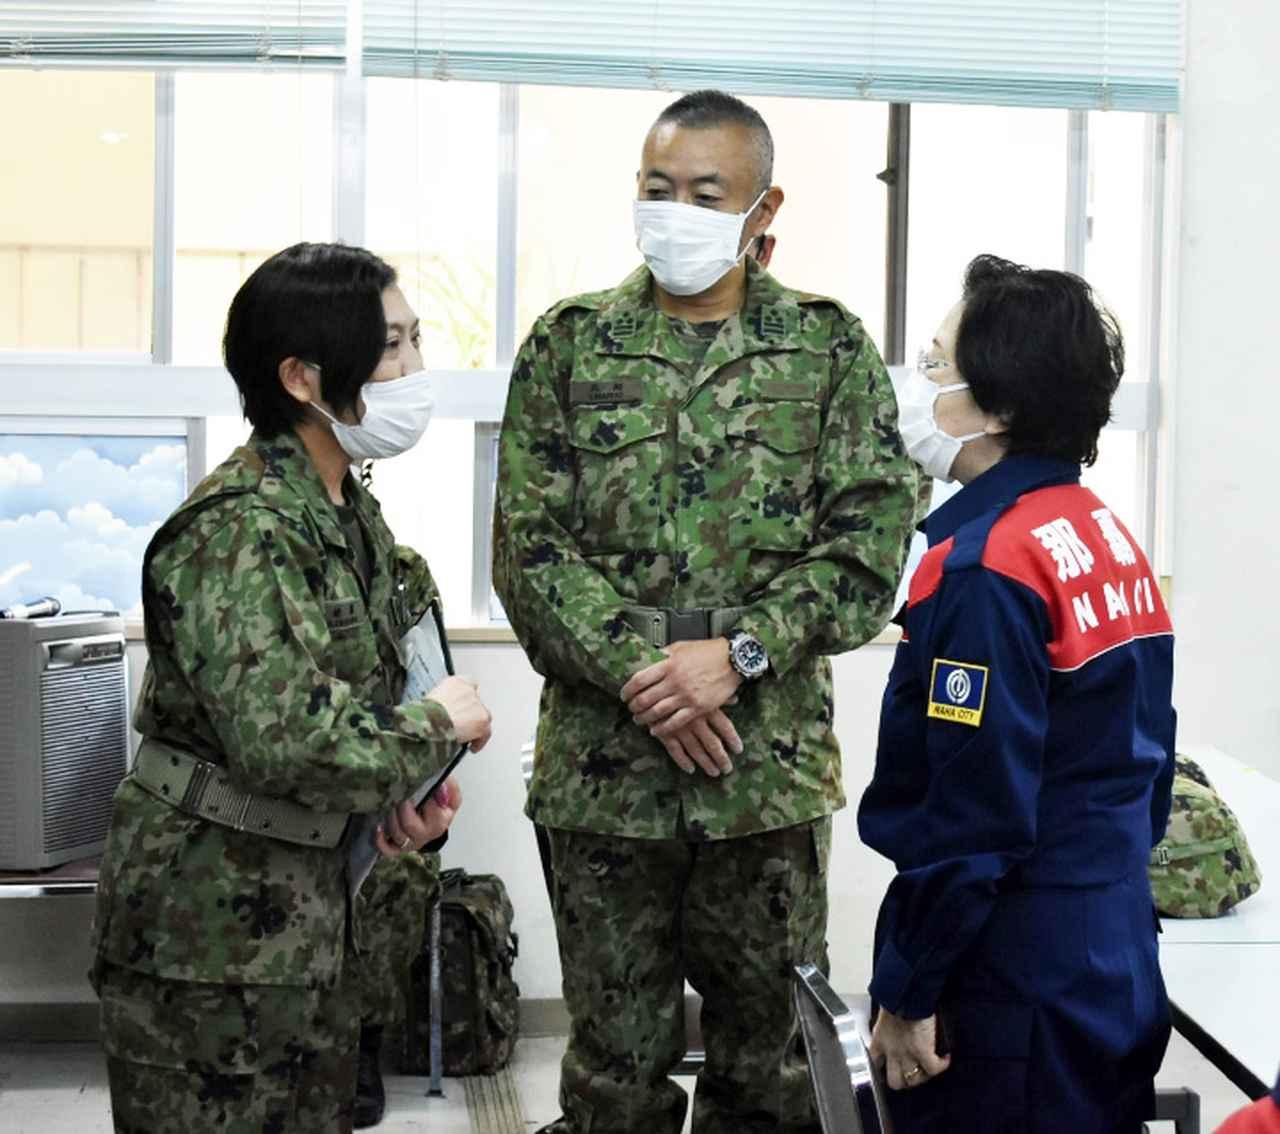 画像: 3月28日、不発弾処理対策本部で那覇市長と(左から本人、15旅団幕僚長、那覇市長)